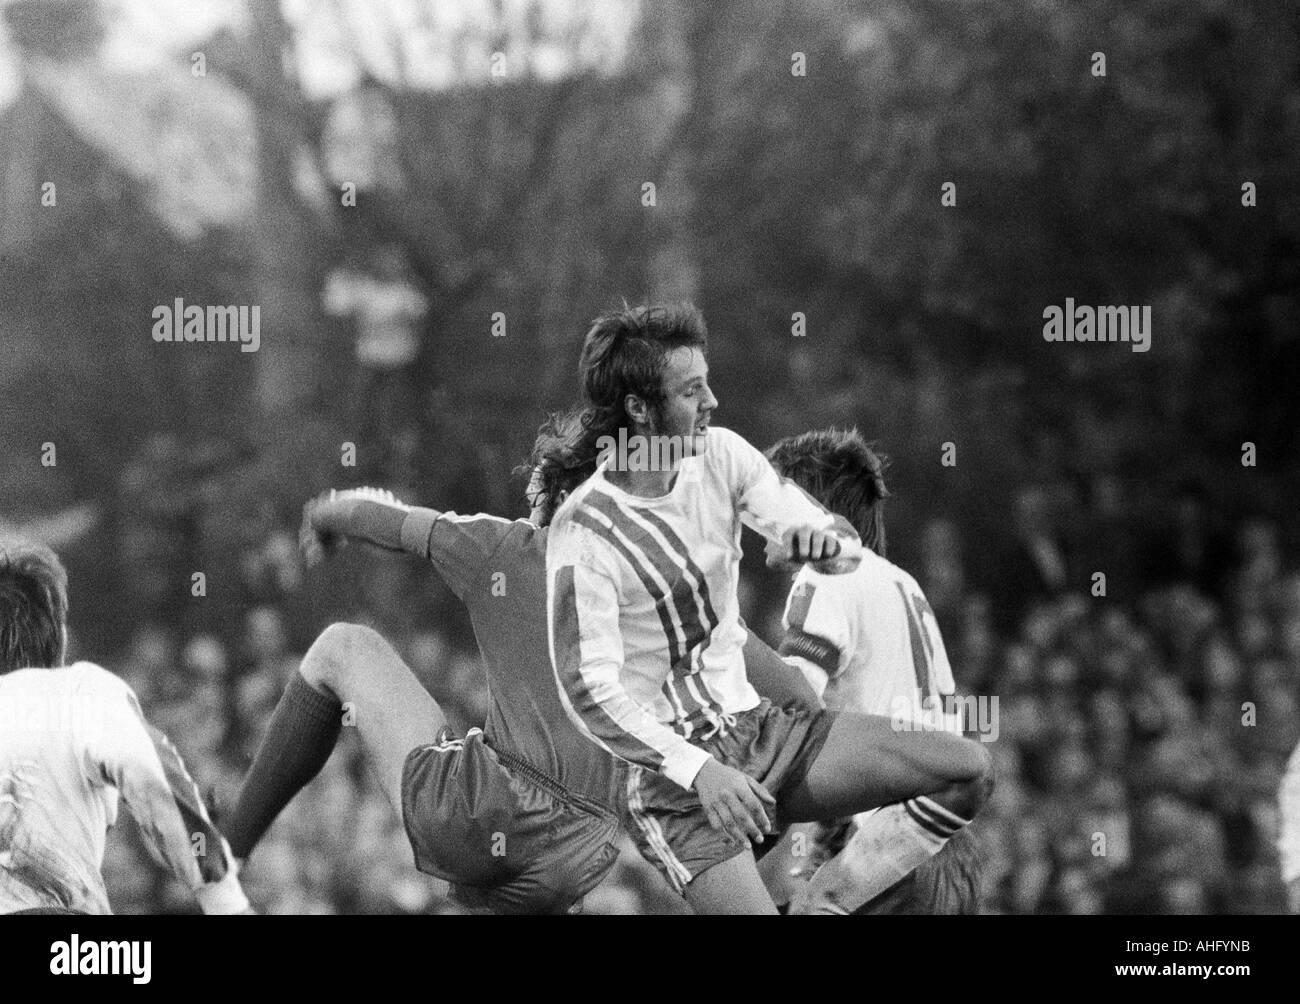 football, Bundesliga, 1973/1974, VfL Bochum versus FC Bayern Munich 0:1, Stadium at the Castroper Strasse in Bochum, scene of the match, Heinz Werner Eggeling (Bochum) fighting for the ball - Stock Image